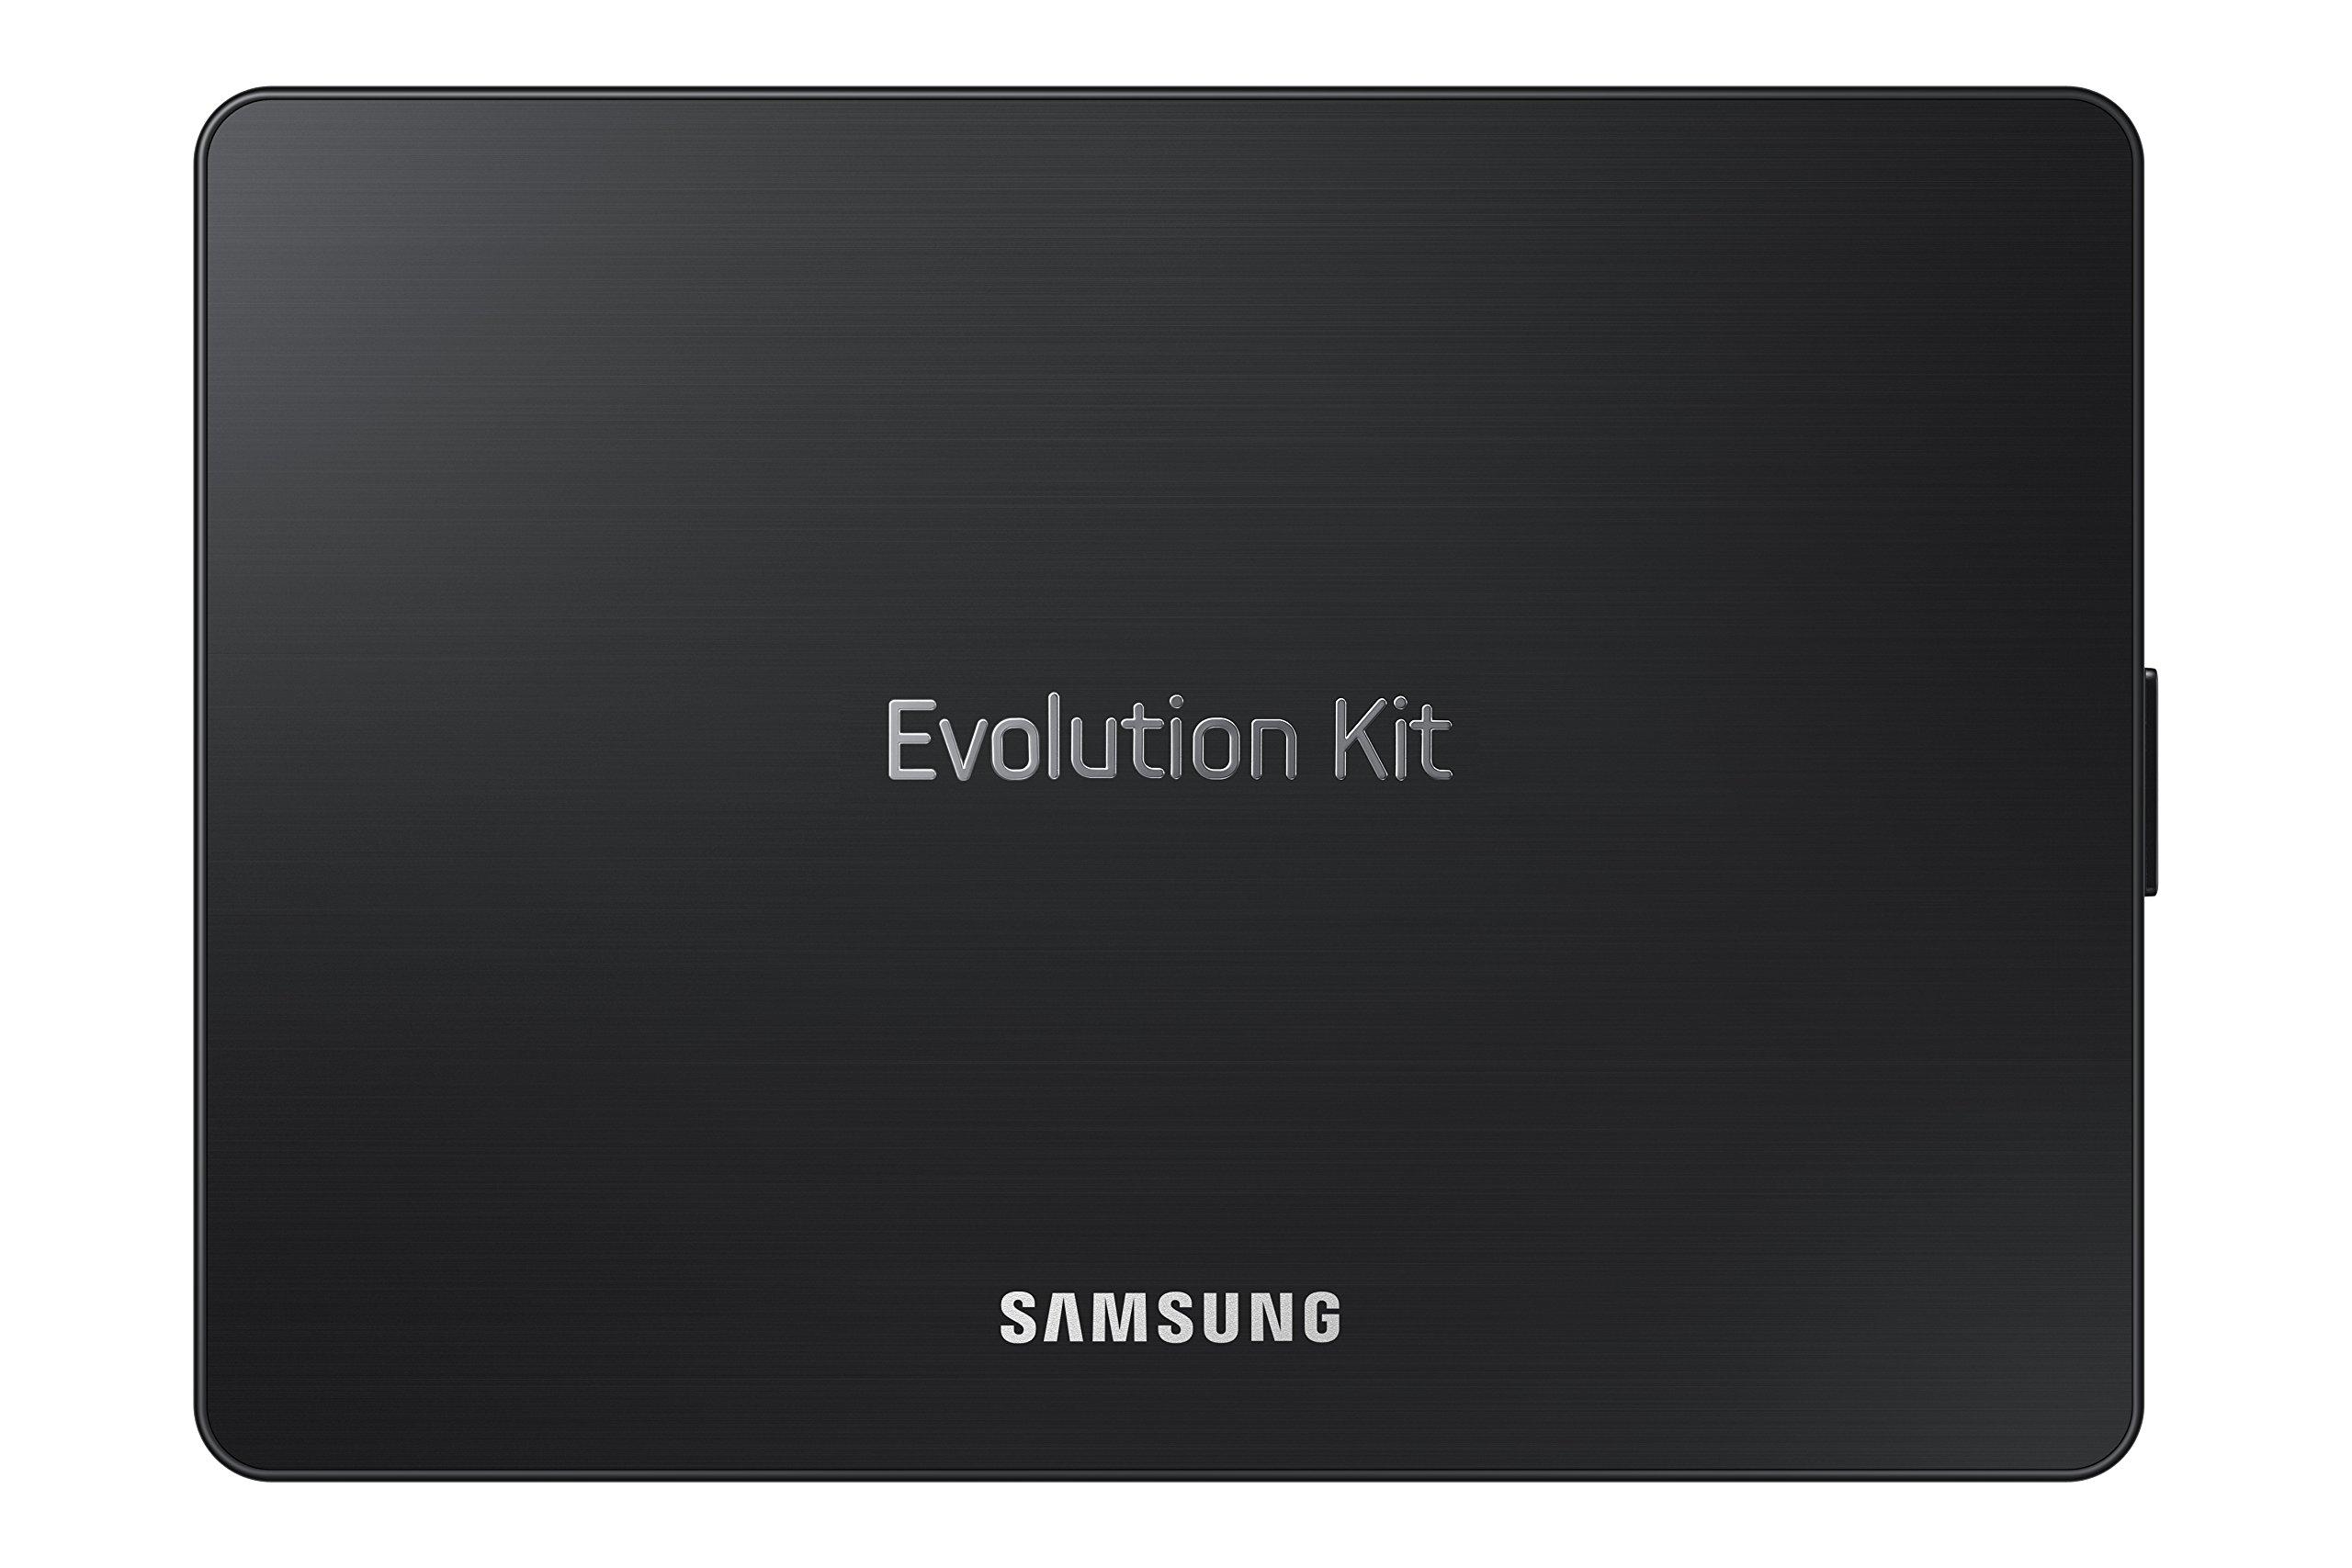 Samsung SEK-2000 Evolution Kit by Samsung